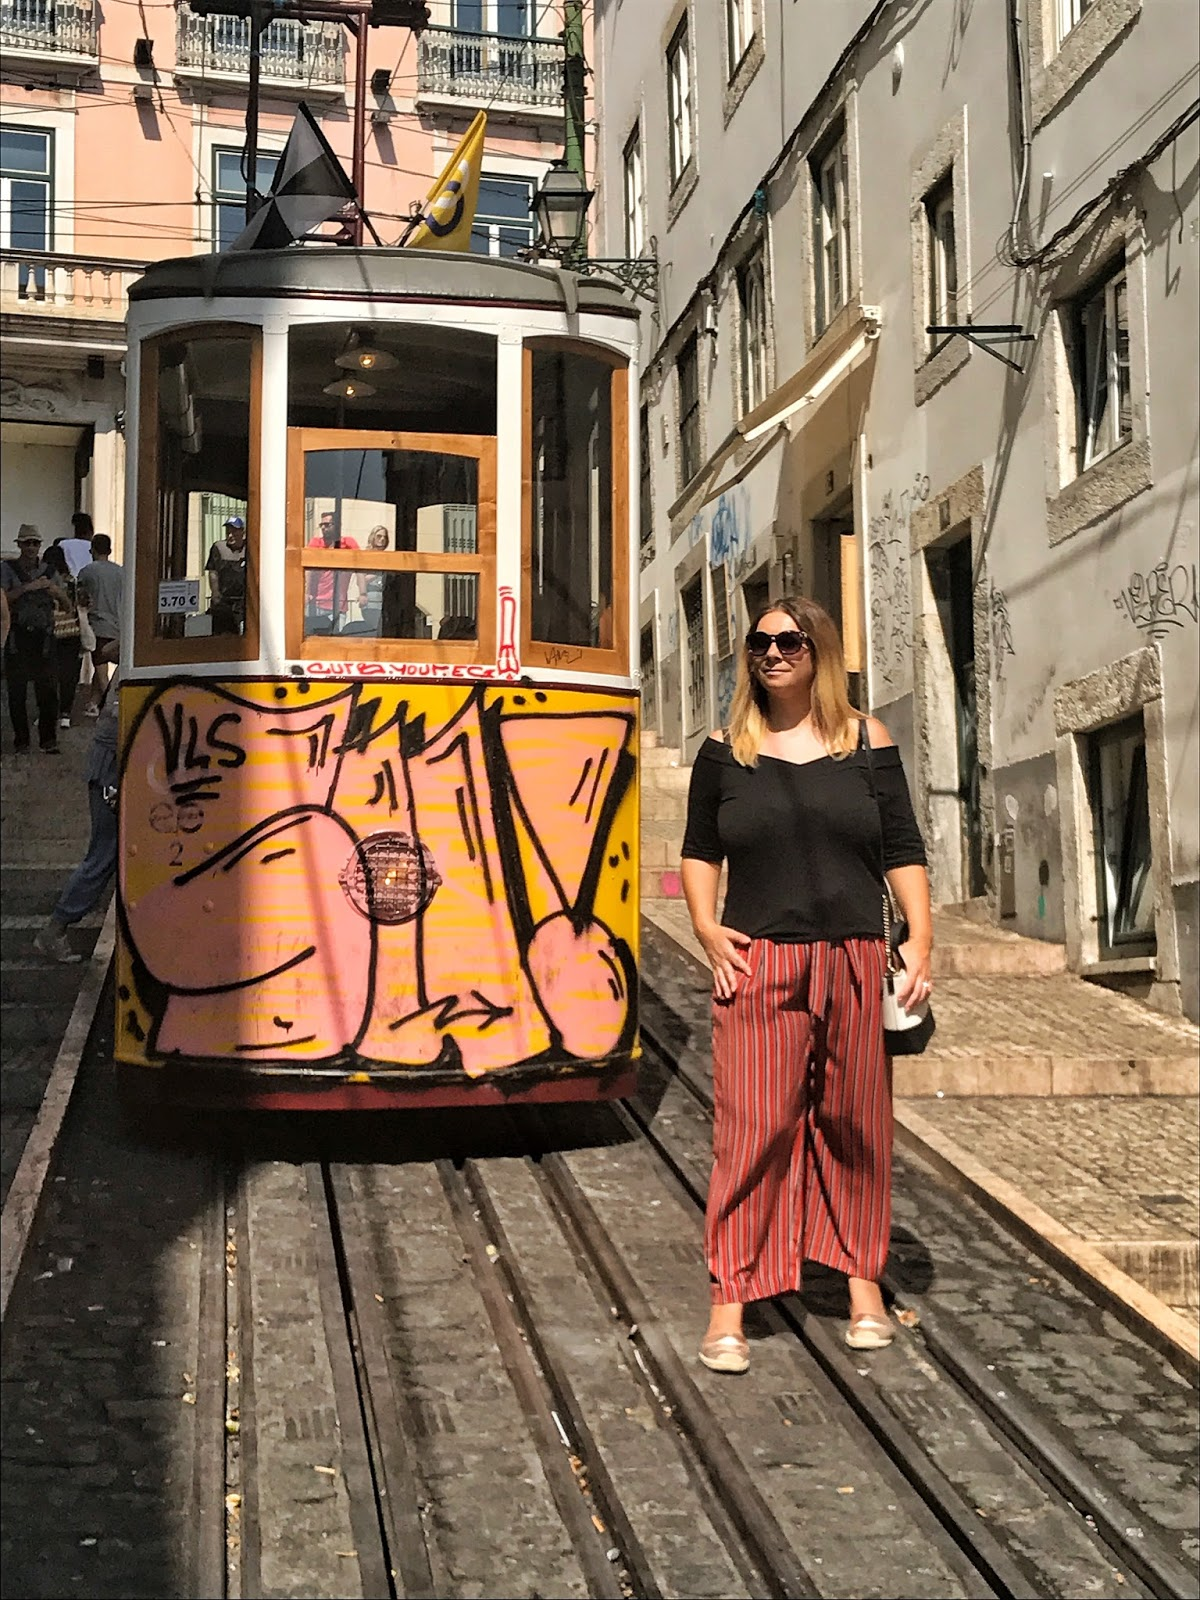 Elevador Da Bica Lisbon's best Instagram photo location for trams!